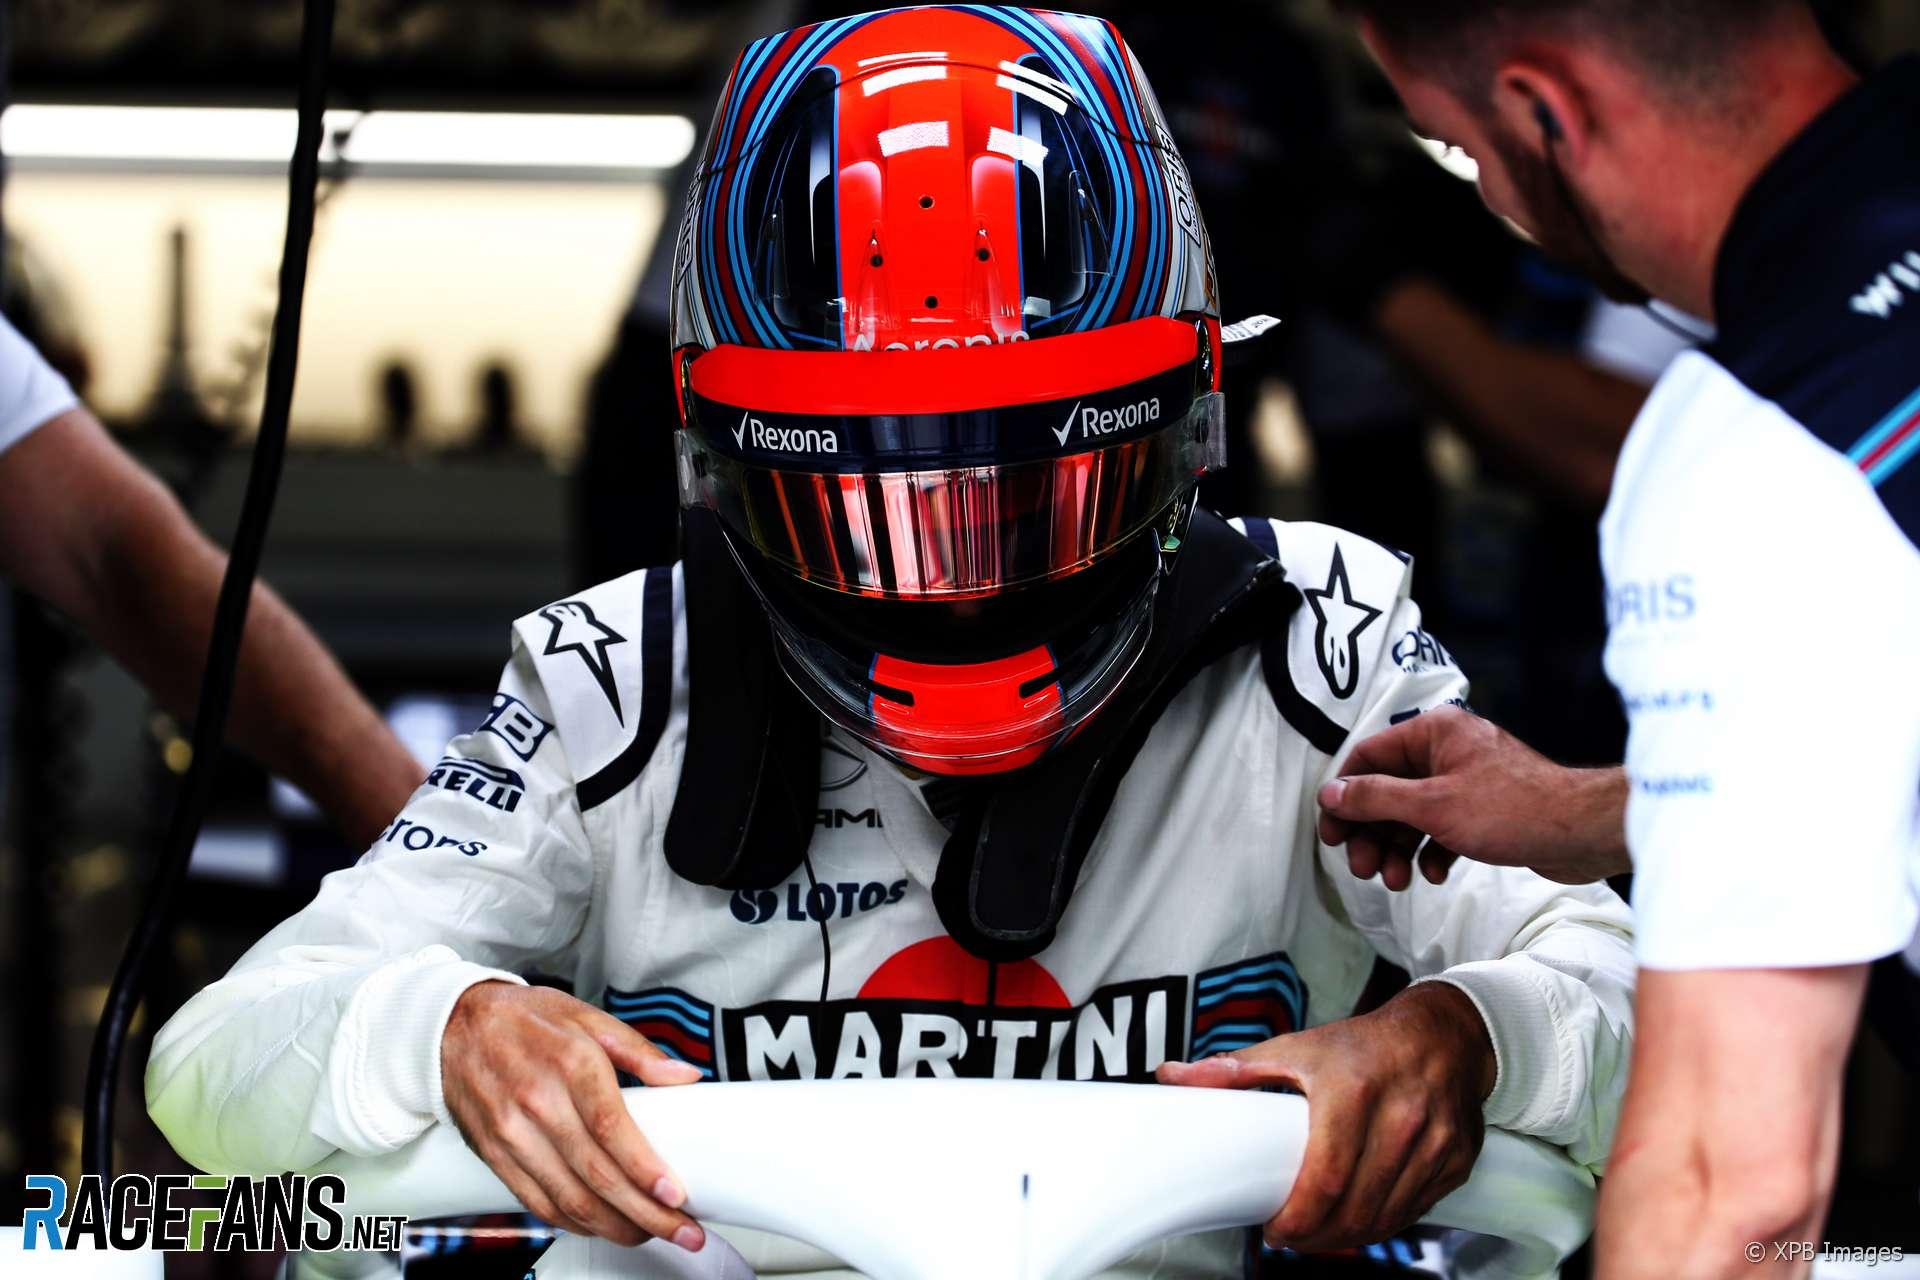 Robert Kubica, Williams, Red Bull Ring, 2018